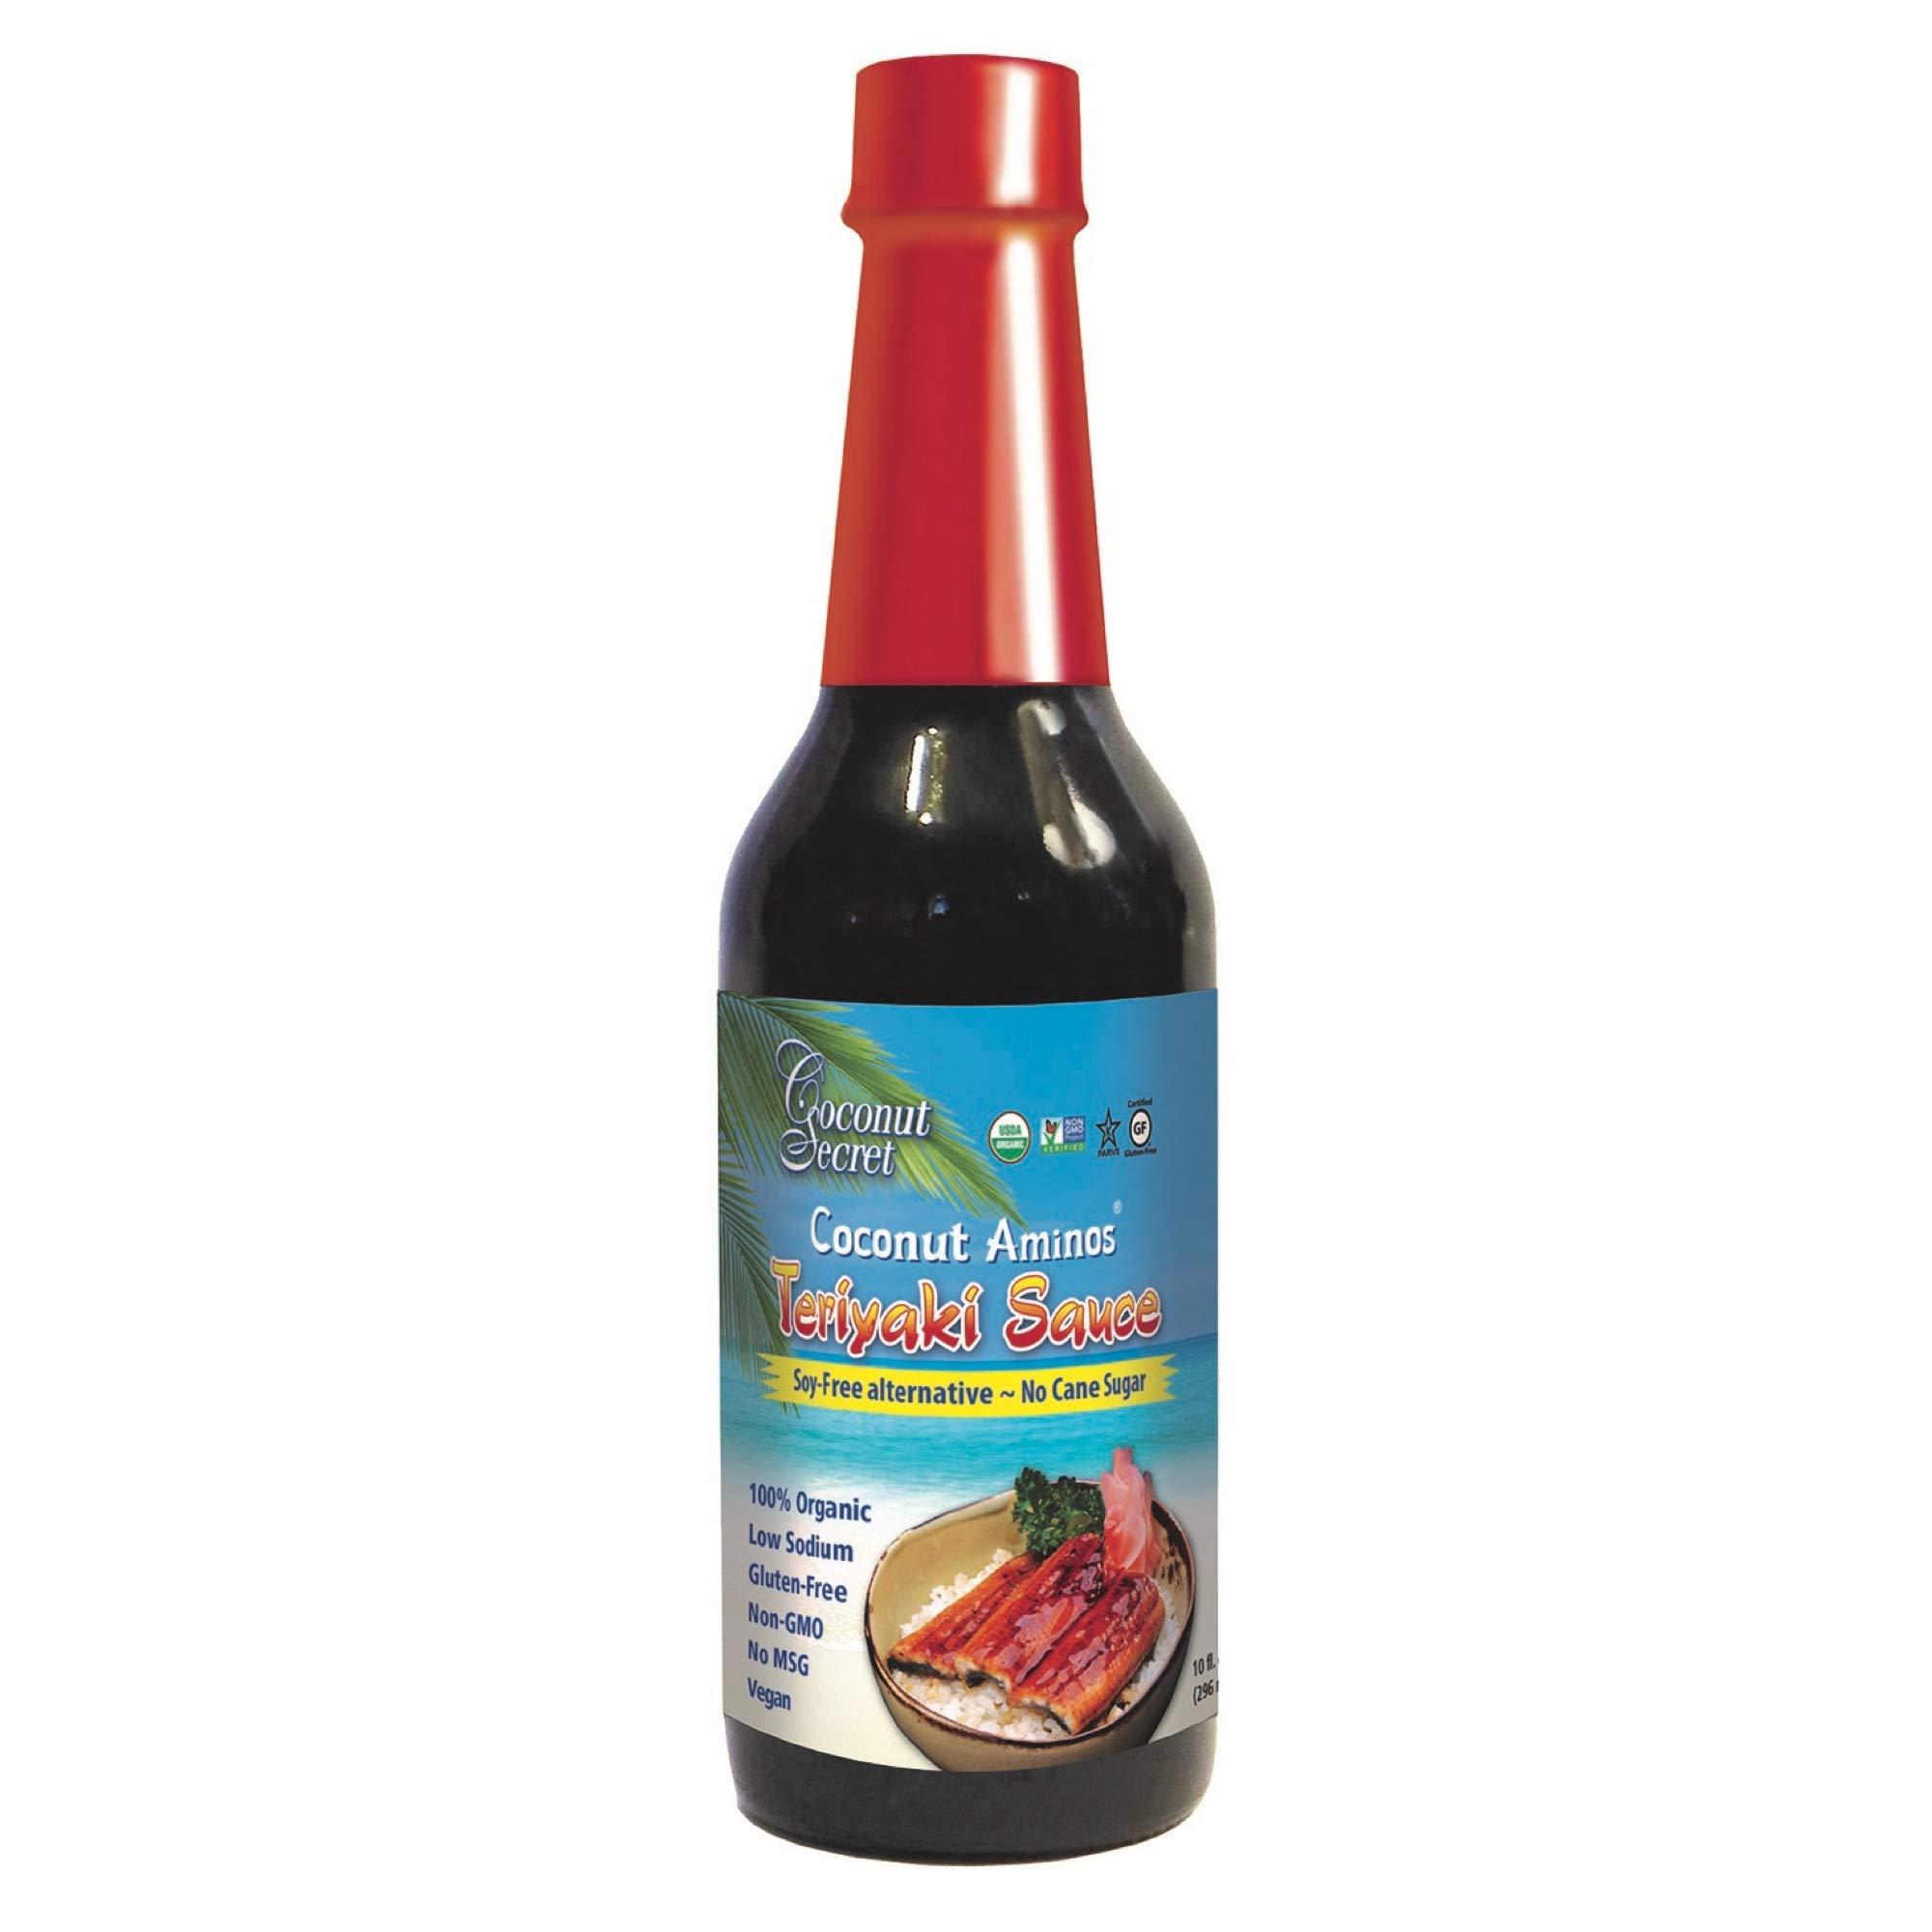 Coconut Secret Coconut Aminos Teriyaki Sauce - 10 fl oz - Low Sodium Soy-Free Teriyaki Alternative, Low Glycemic - Organic, Vegan, Non-GMO, Gluten-Free, Kosher - 20 Servings